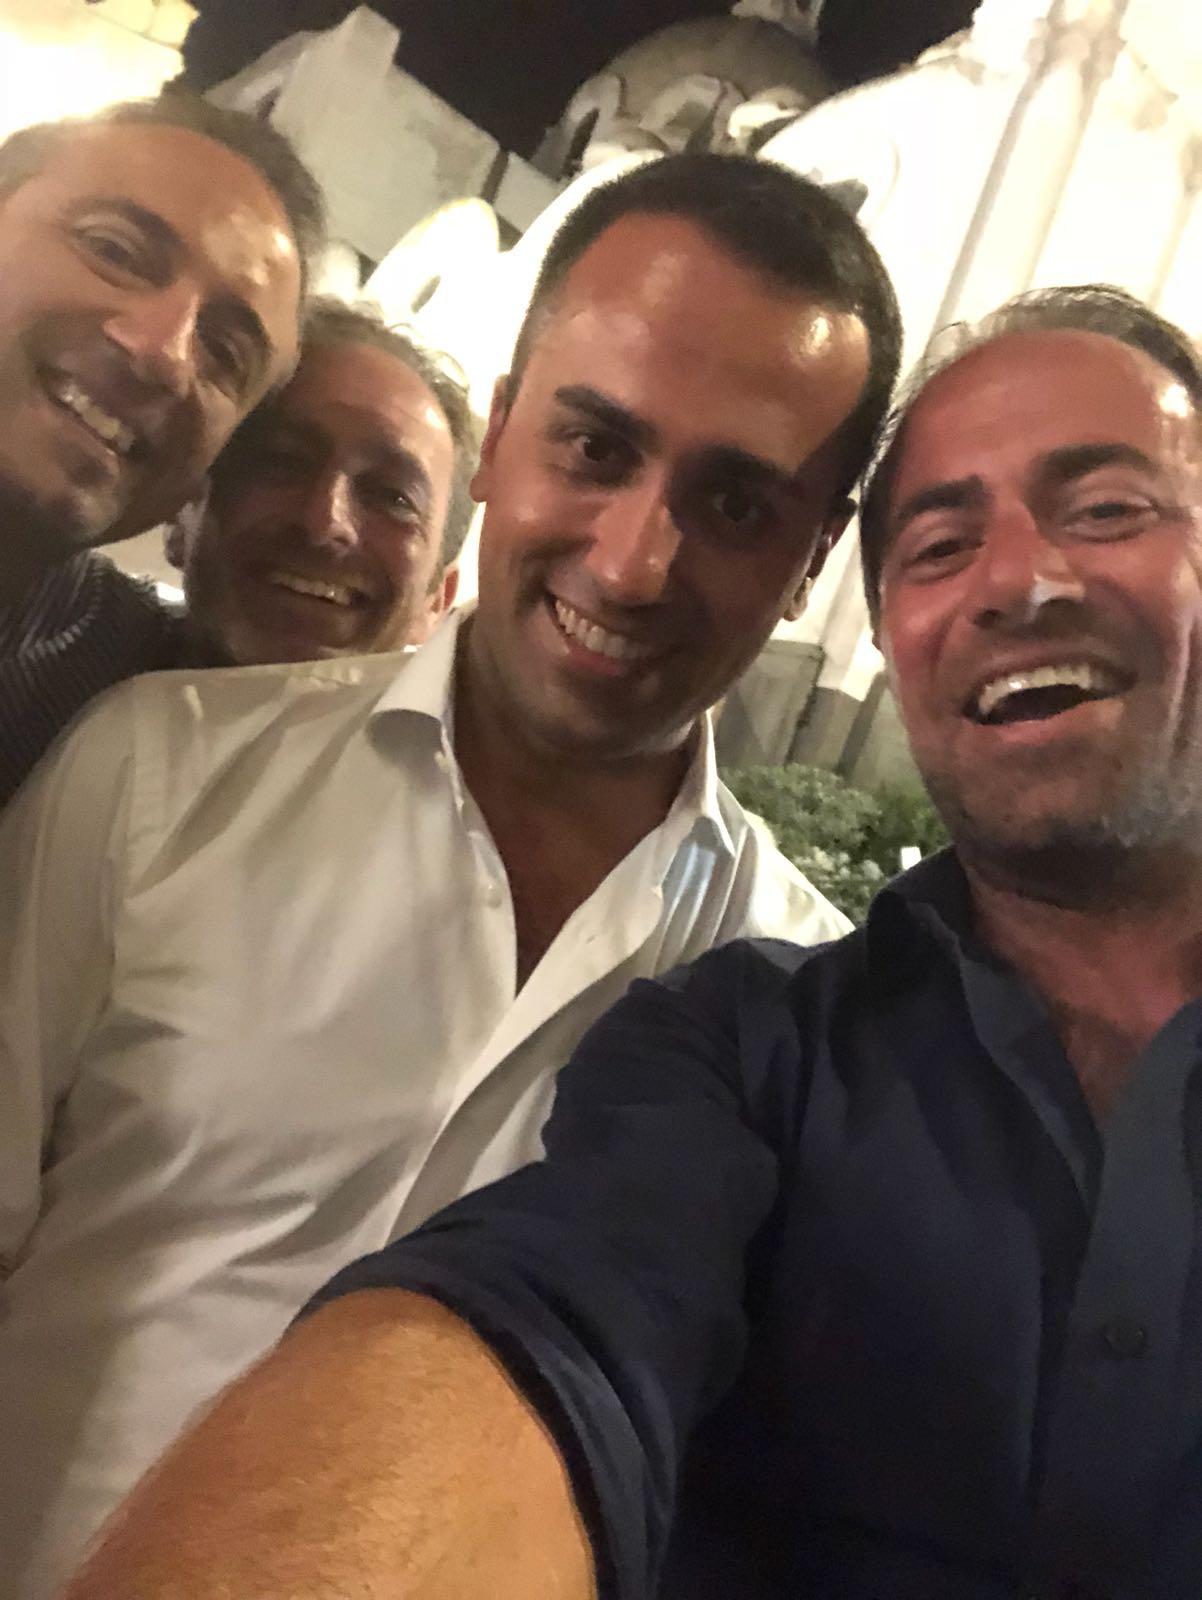 Di Maio a Capri, Selfie in Piazzetta e Cena con gli amici di sempre (FOTO)